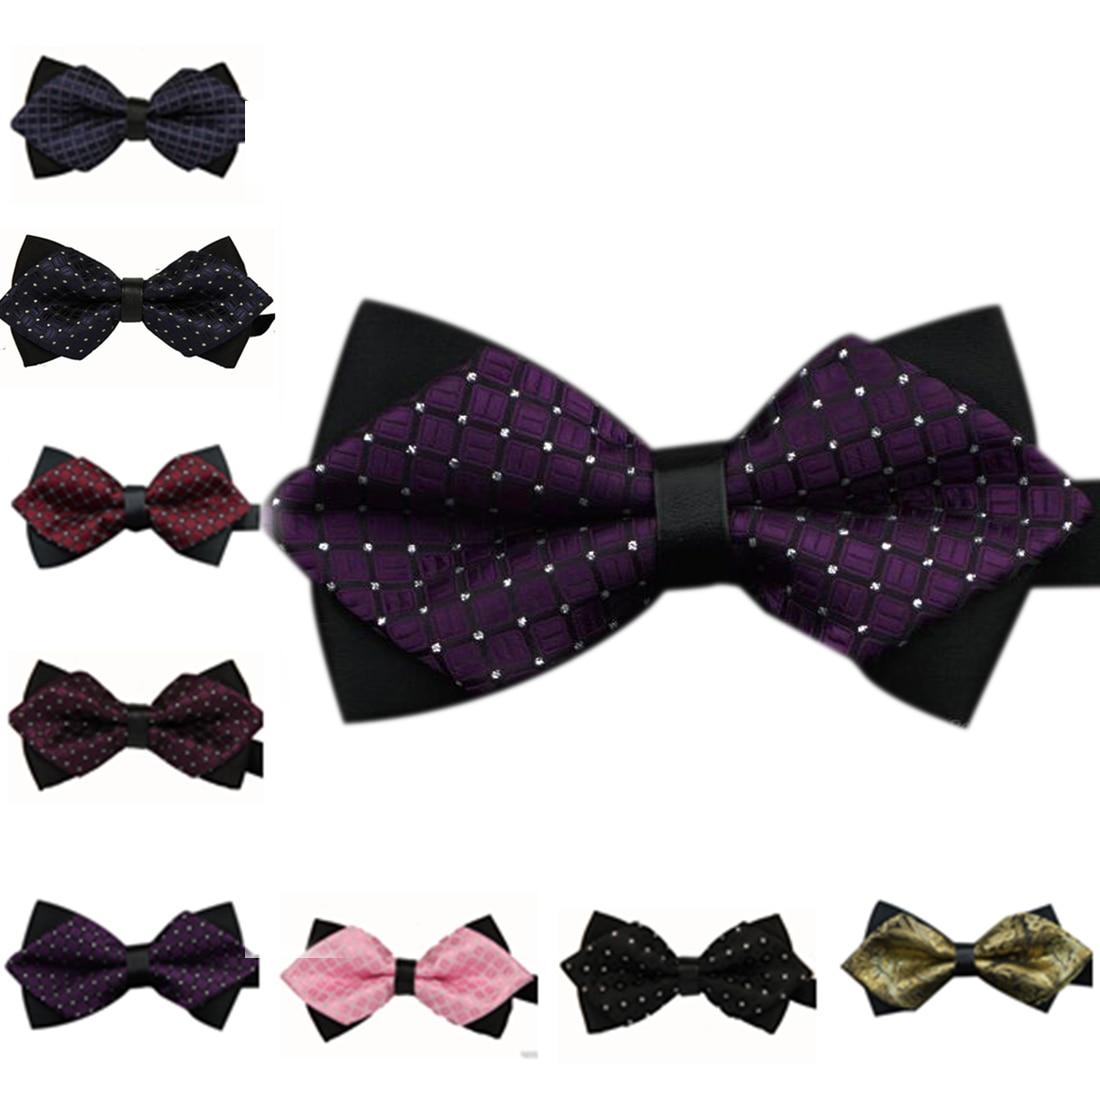 New 2016 Formal Commercial Bow Tie Fashion Men Bowties For Boys Accessories Cravat Bowtie